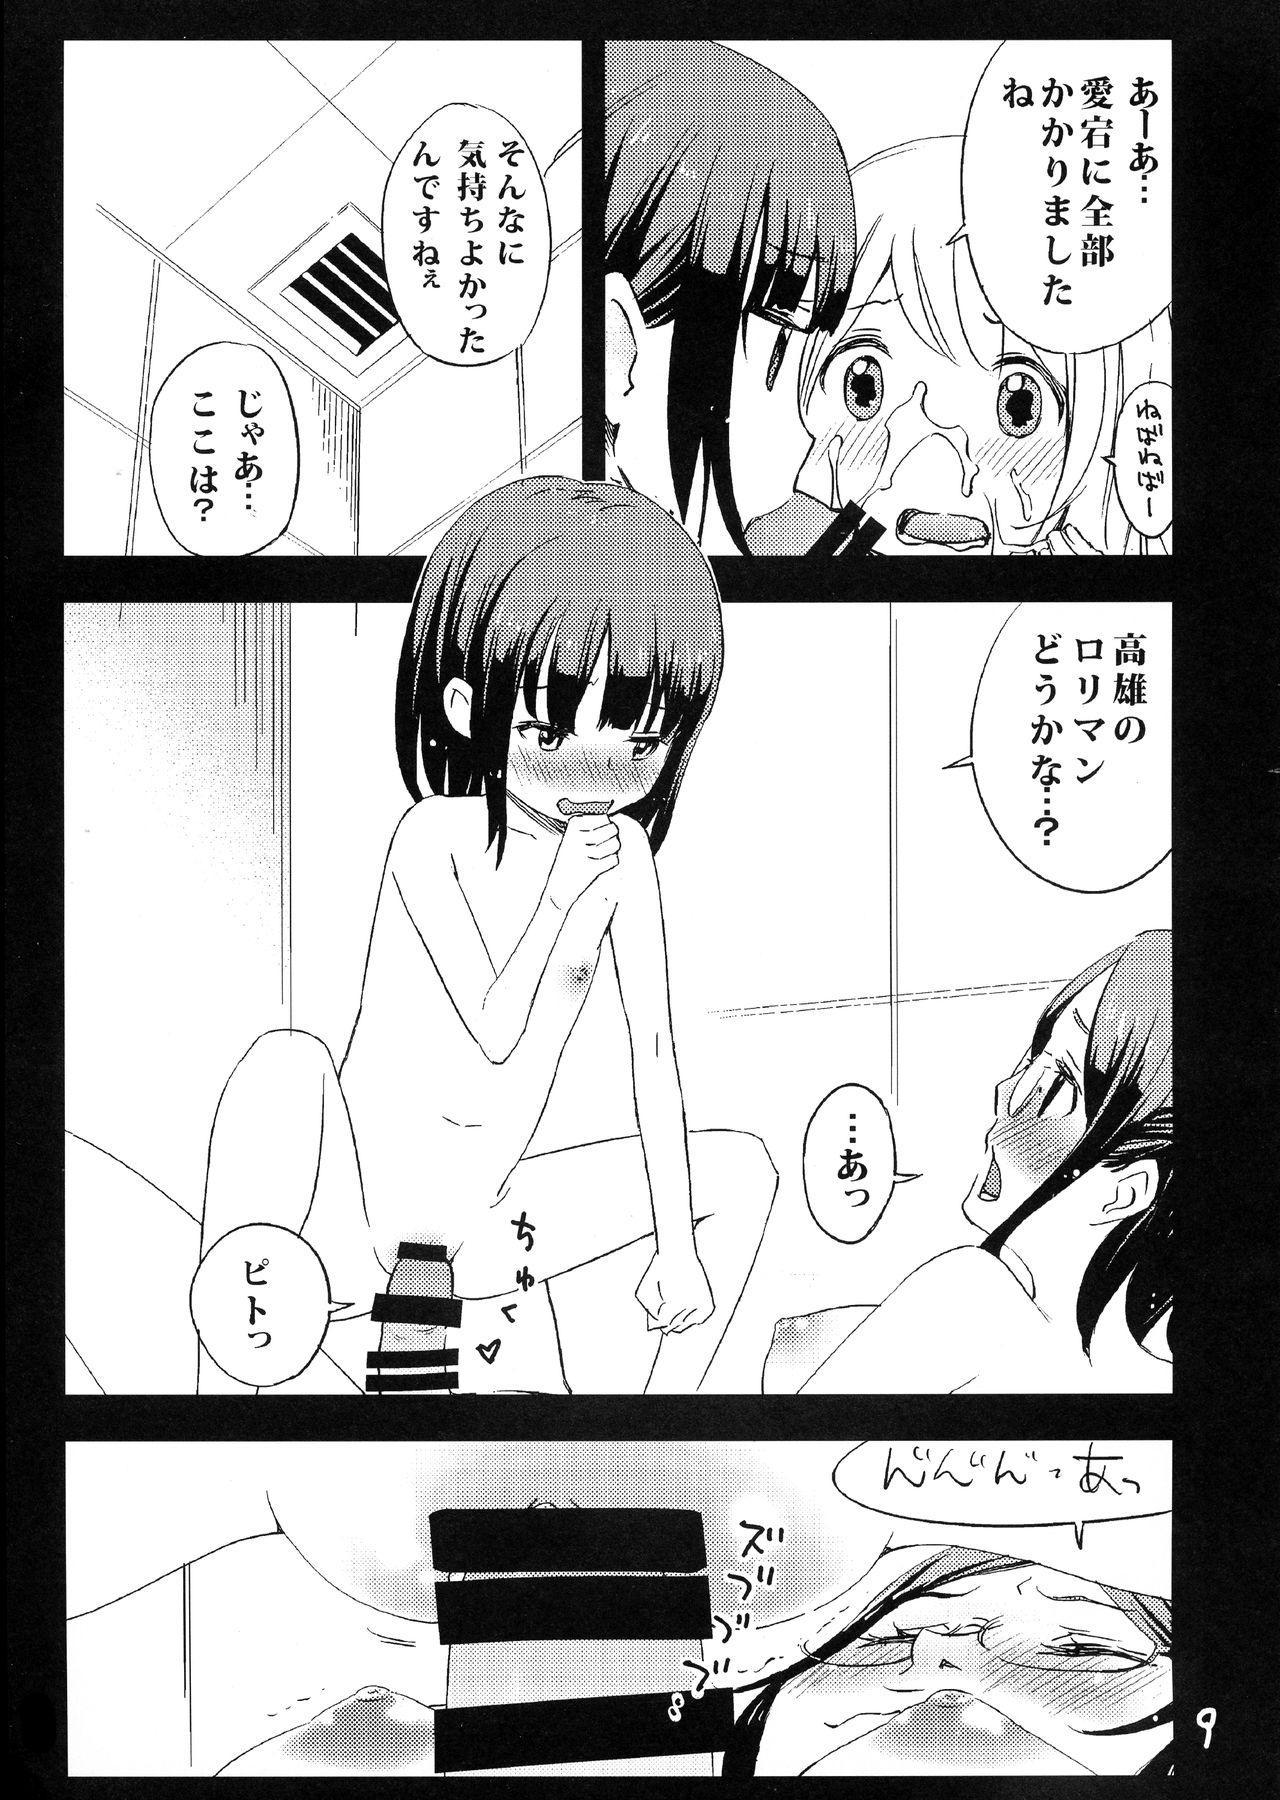 Futanari! Kirishima n 8